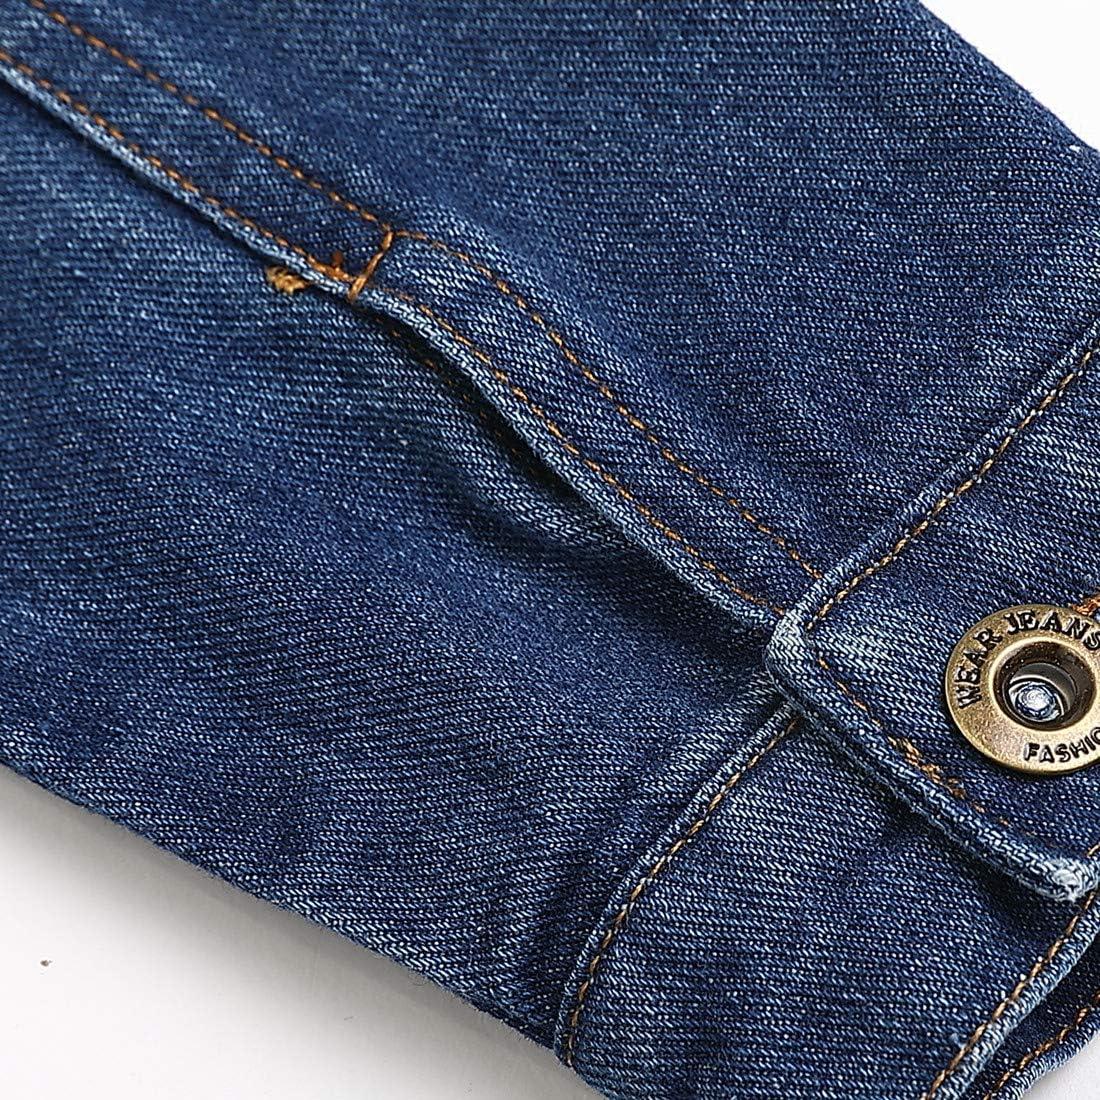 Sooxiwood Little Boys Denim Jacket Buttons Pocket